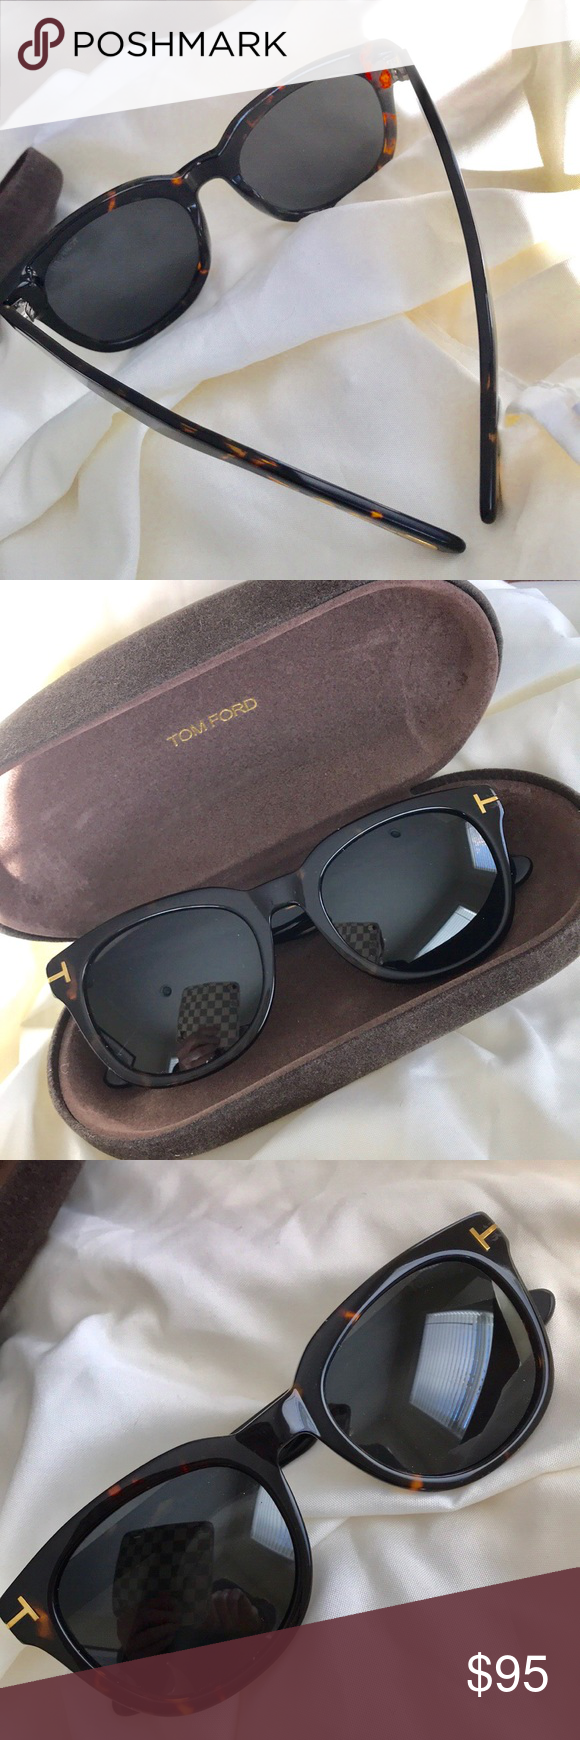 69e58304ec2 Tom Ford Unisex Cary Sunglasses Wayfarer Tortoise Unisex. Classic Tom Ford  iconic Cary Wayfarer Sunglasses